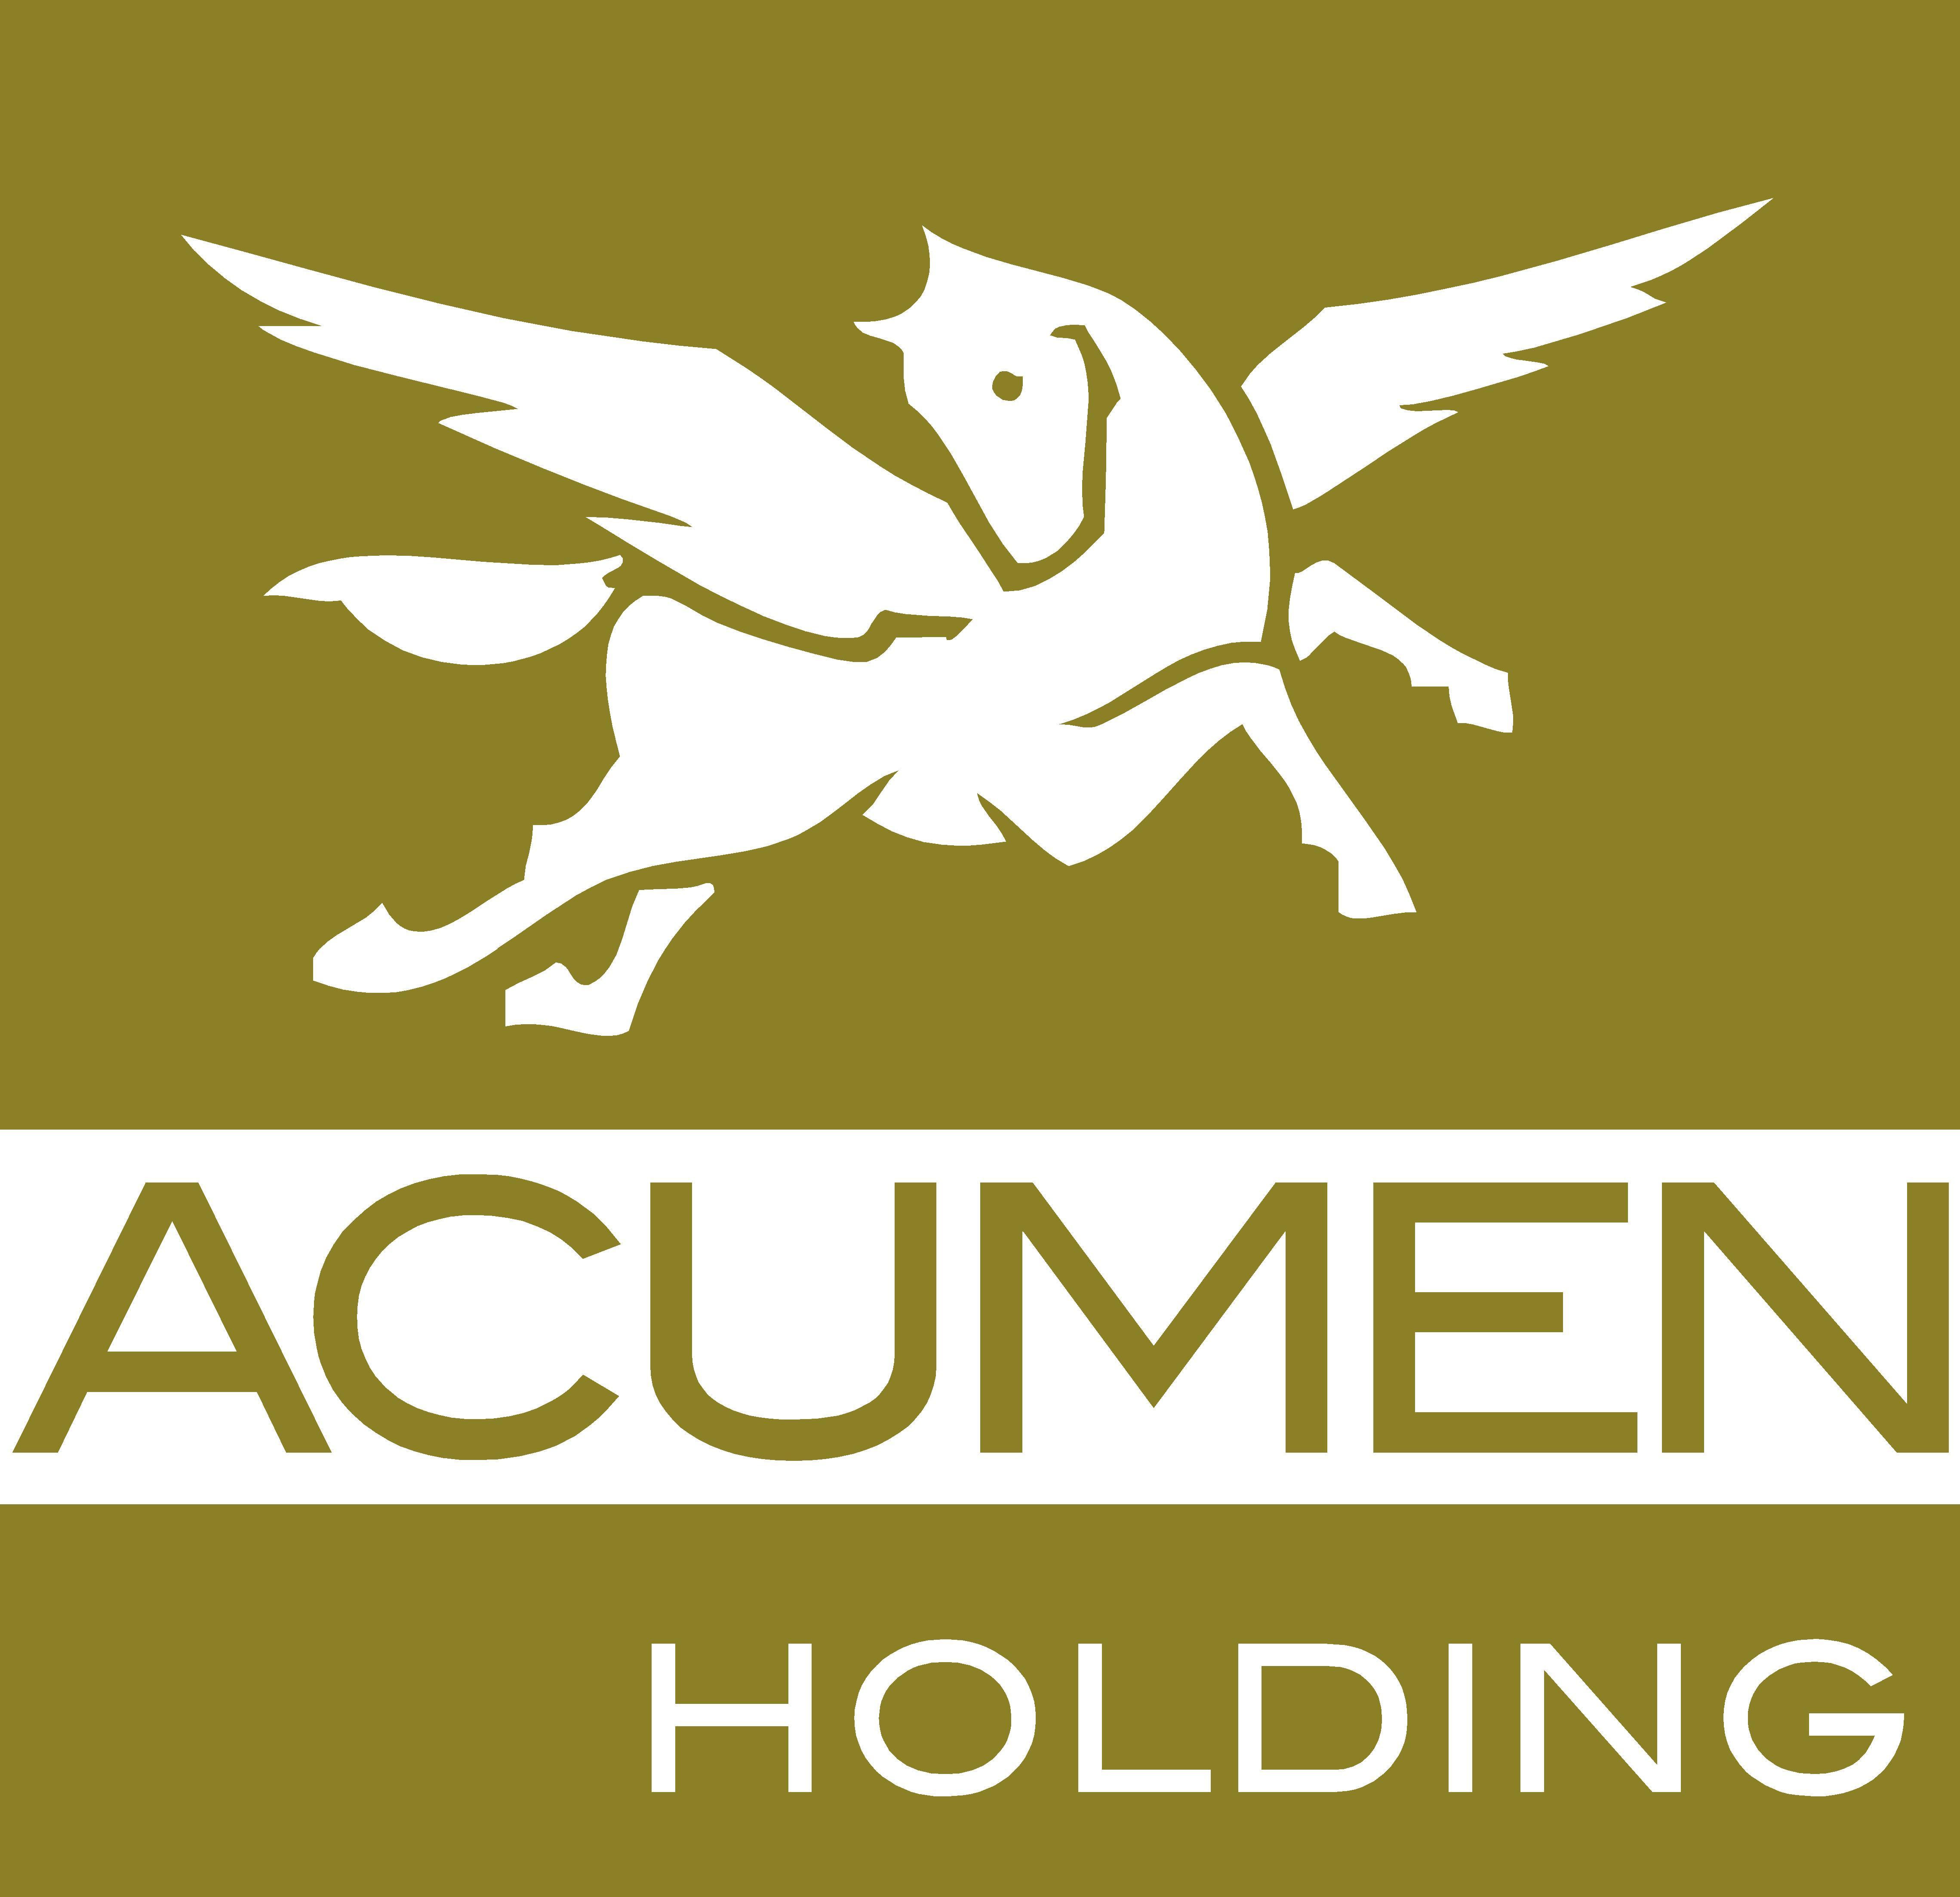 Acumen Holding New Logo